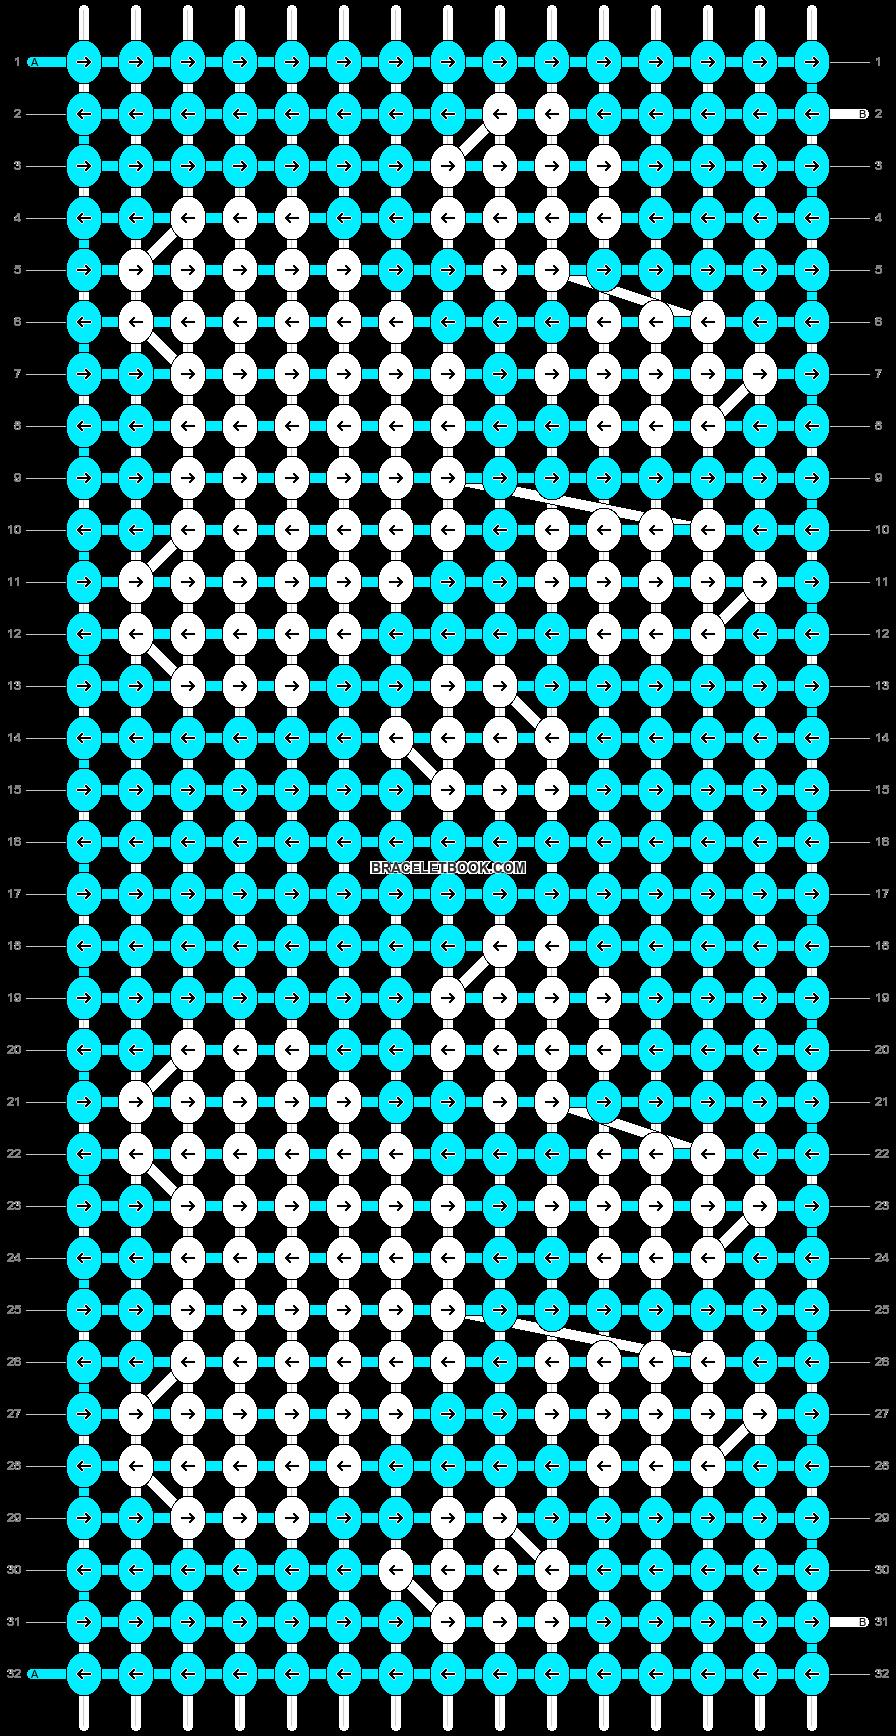 Alpha Pattern #3150 added by gatorgirl